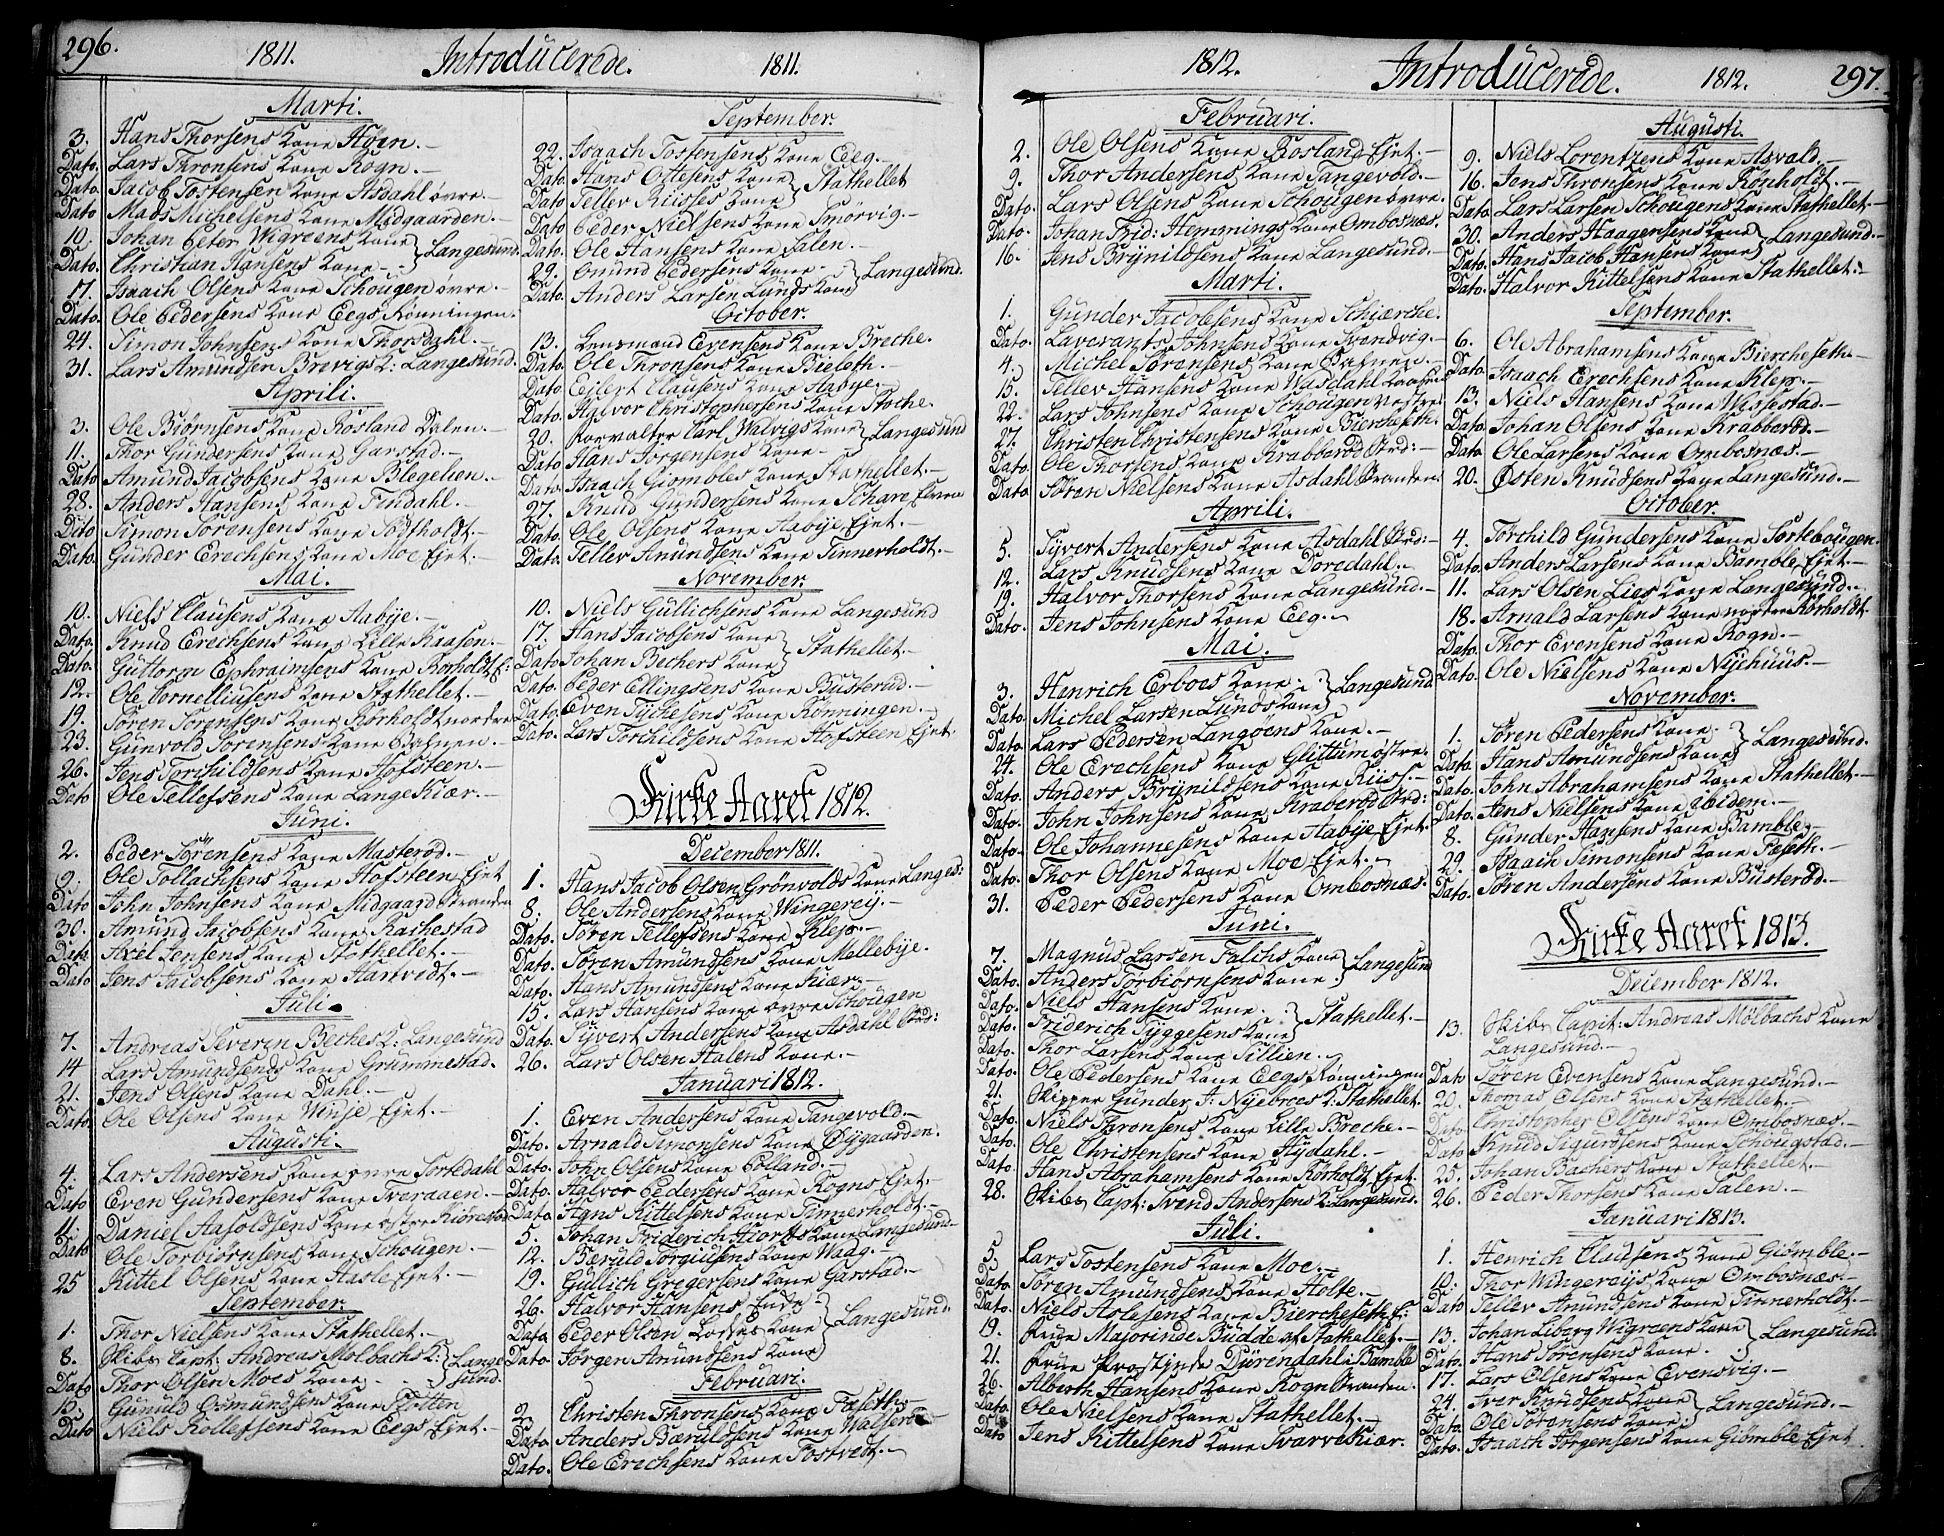 SAKO, Bamble kirkebøker, F/Fa/L0002: Ministerialbok nr. I 2, 1775-1814, s. 296-297